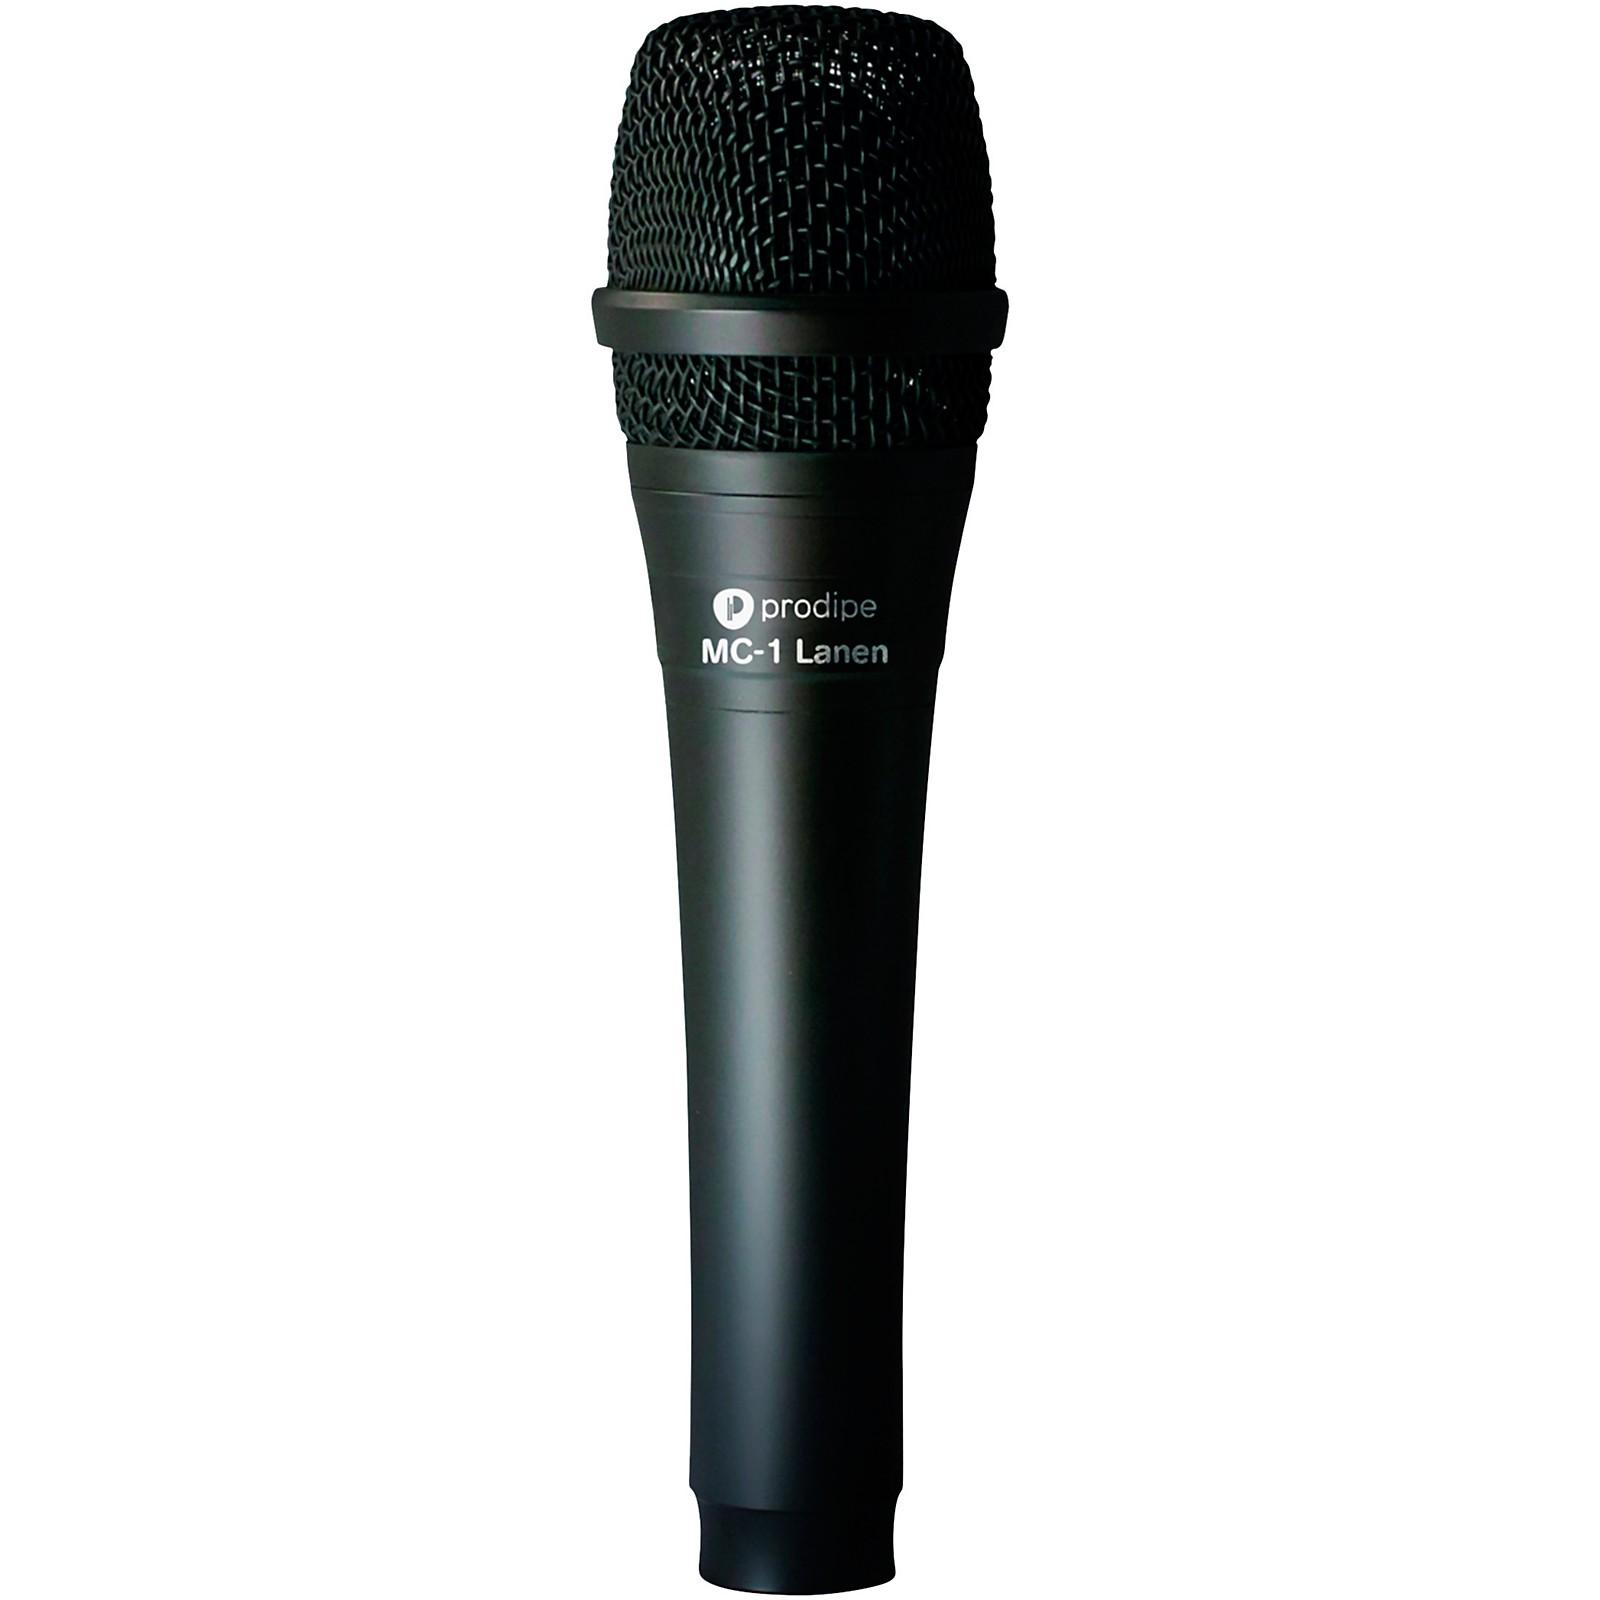 Prodipe MC-1 Professional Dynamic Microphone